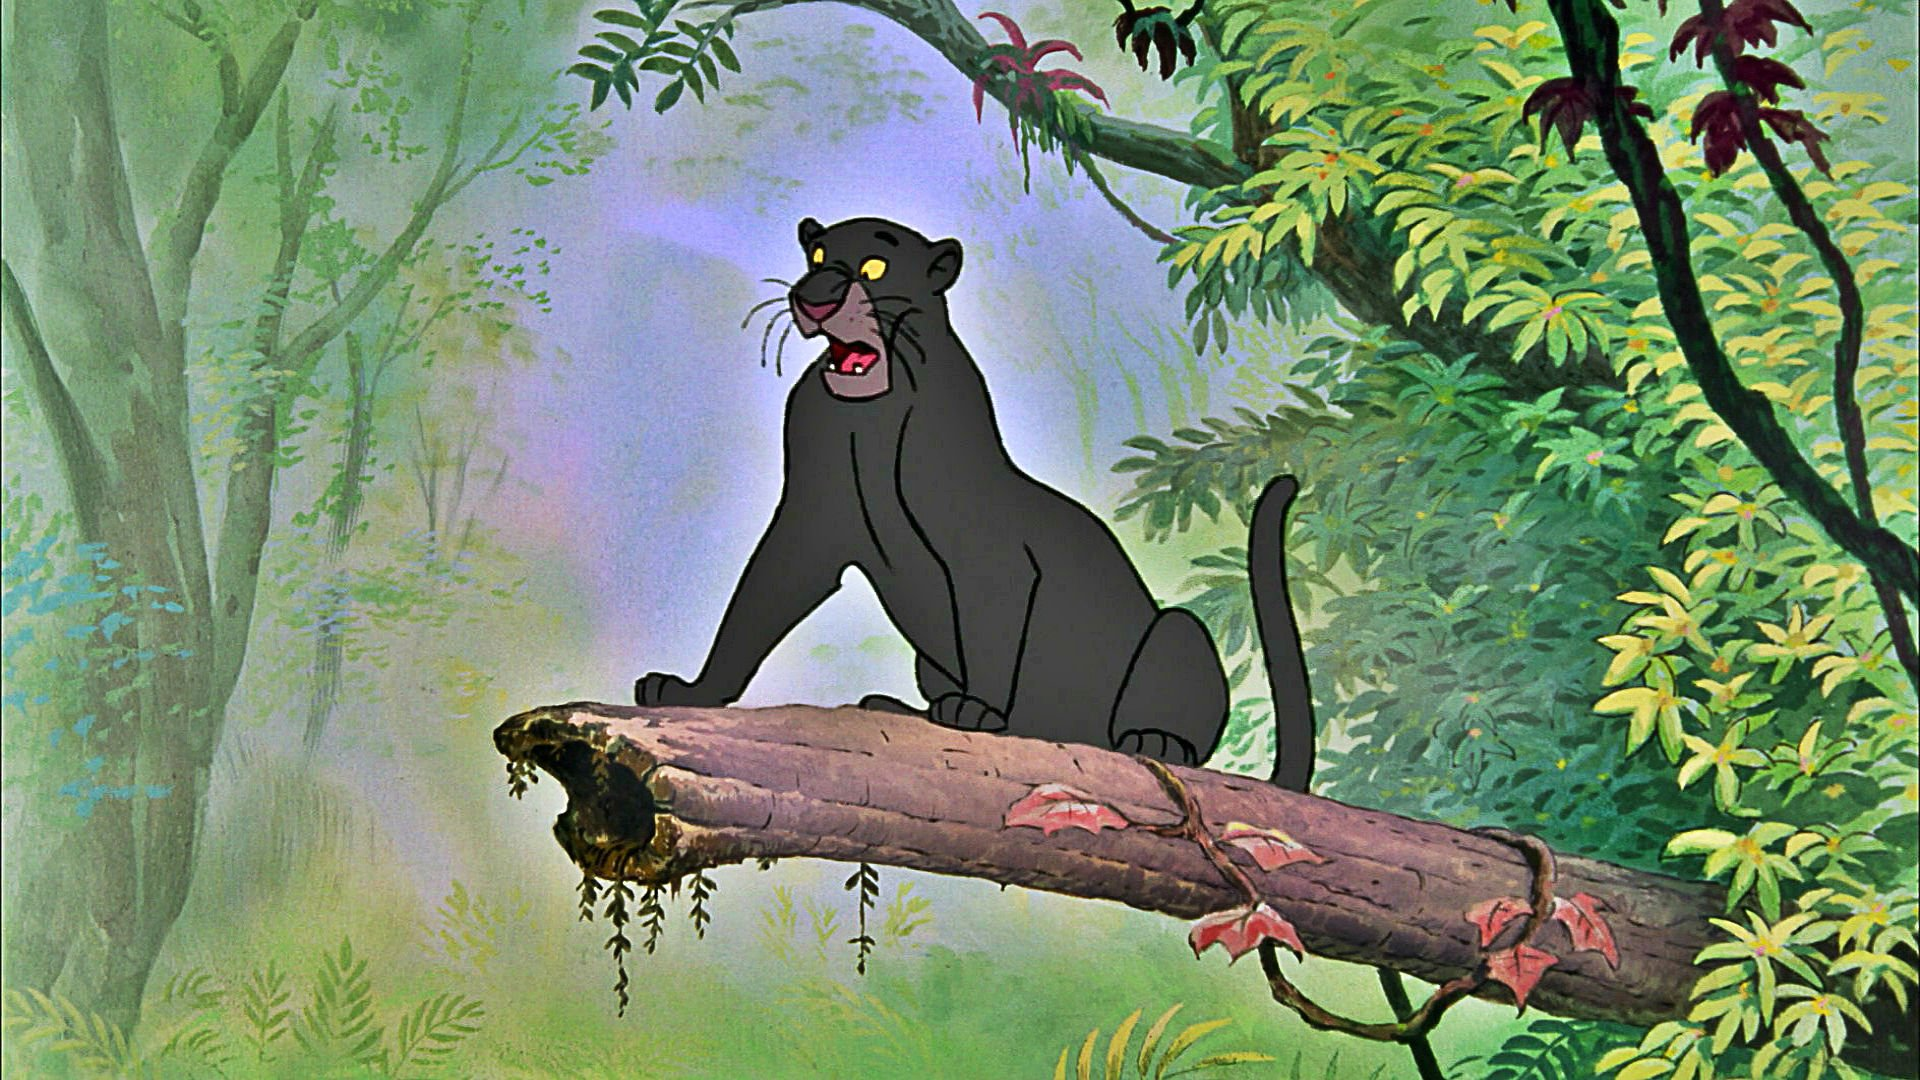 jungle book wallpaper jungle book fantasy family cartoon comedy